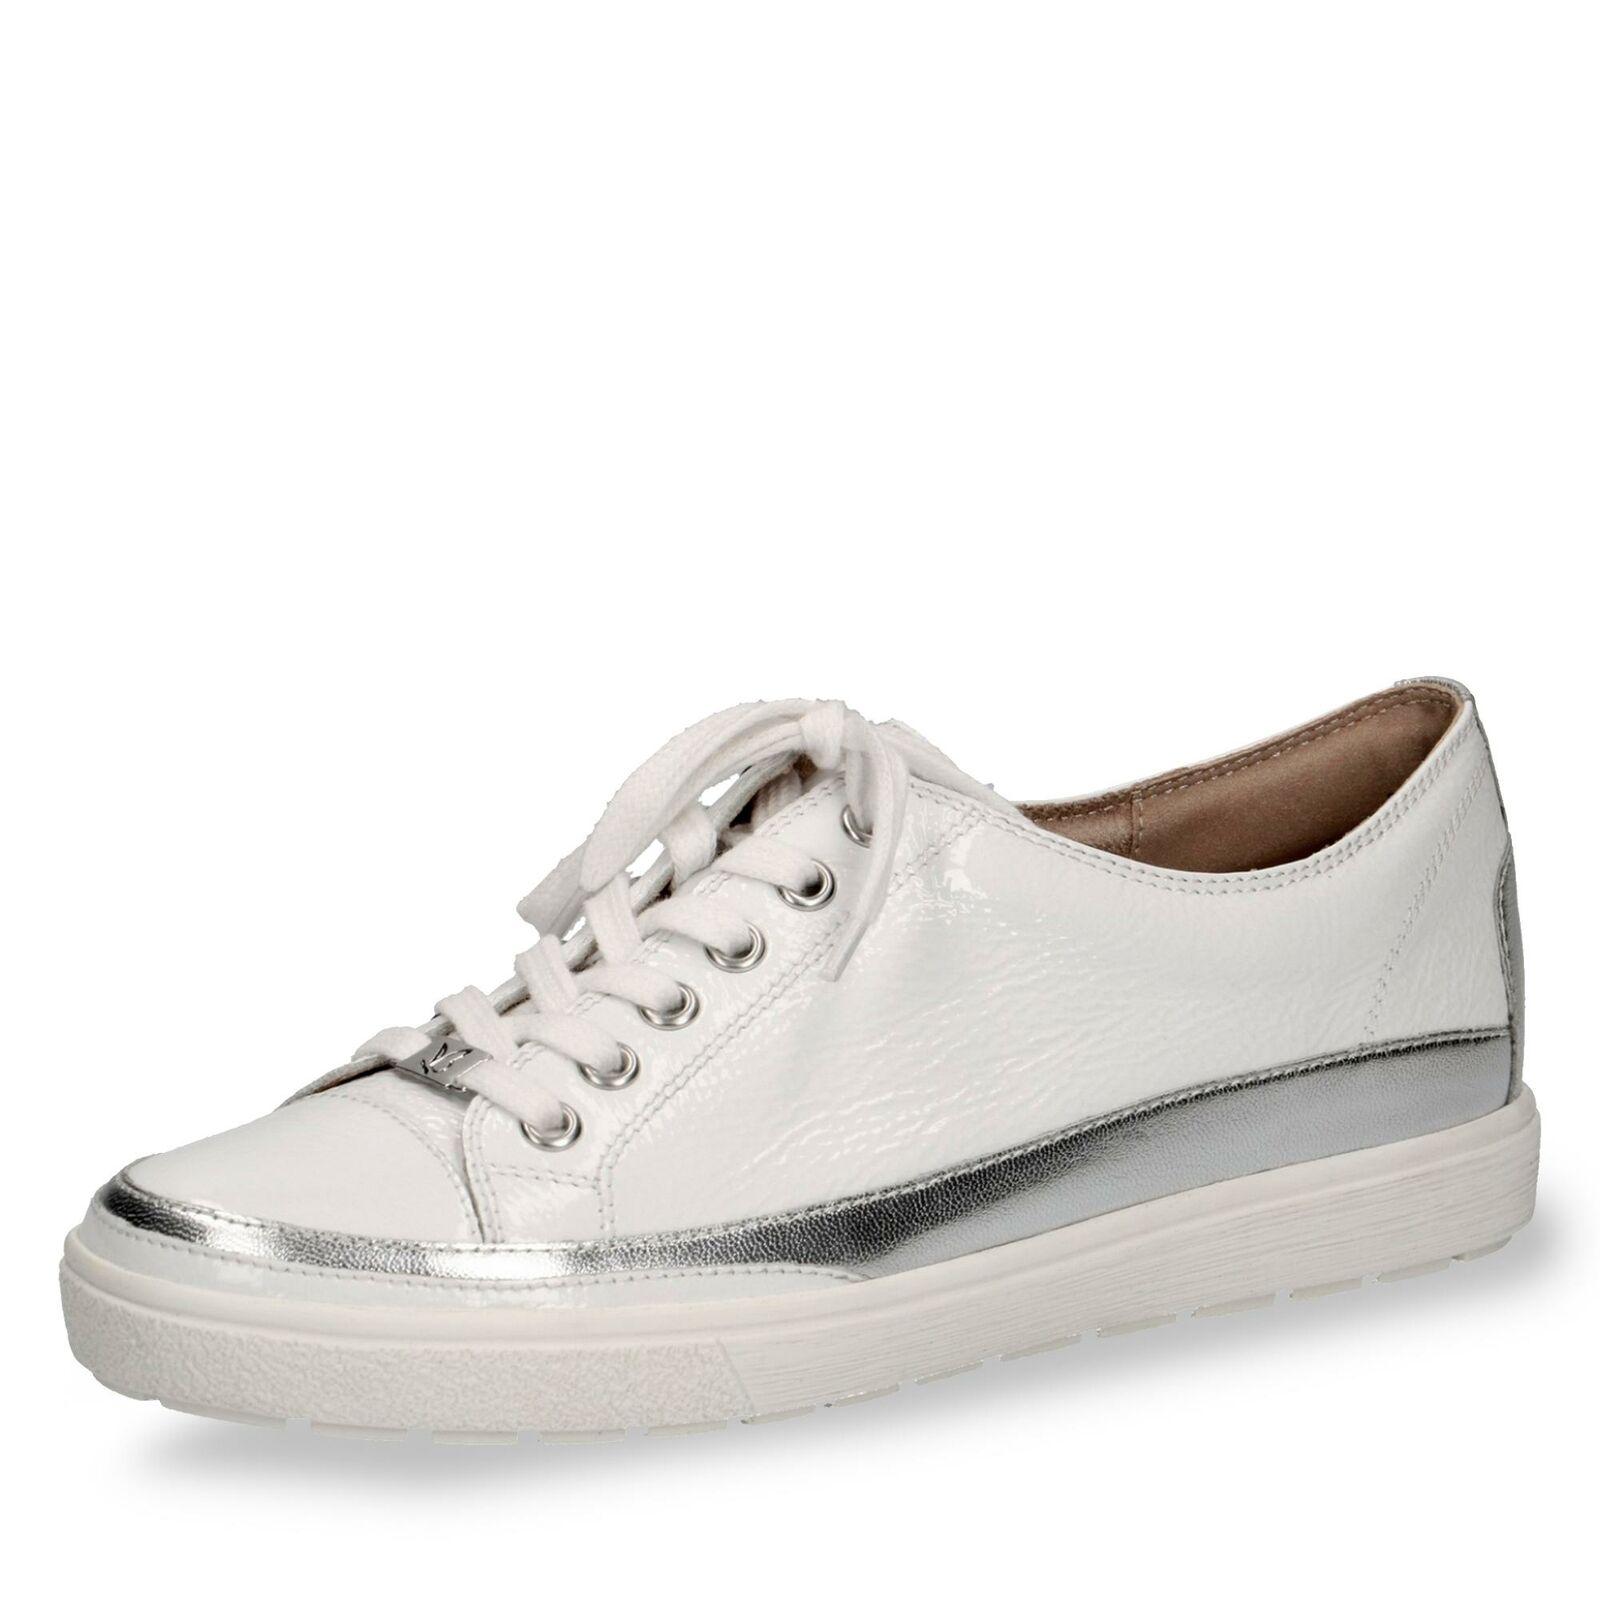 Caprice Damen Schnürschuhe Komfortschuhe Halbschuhe Freizeitschuhe Lack Schuhe